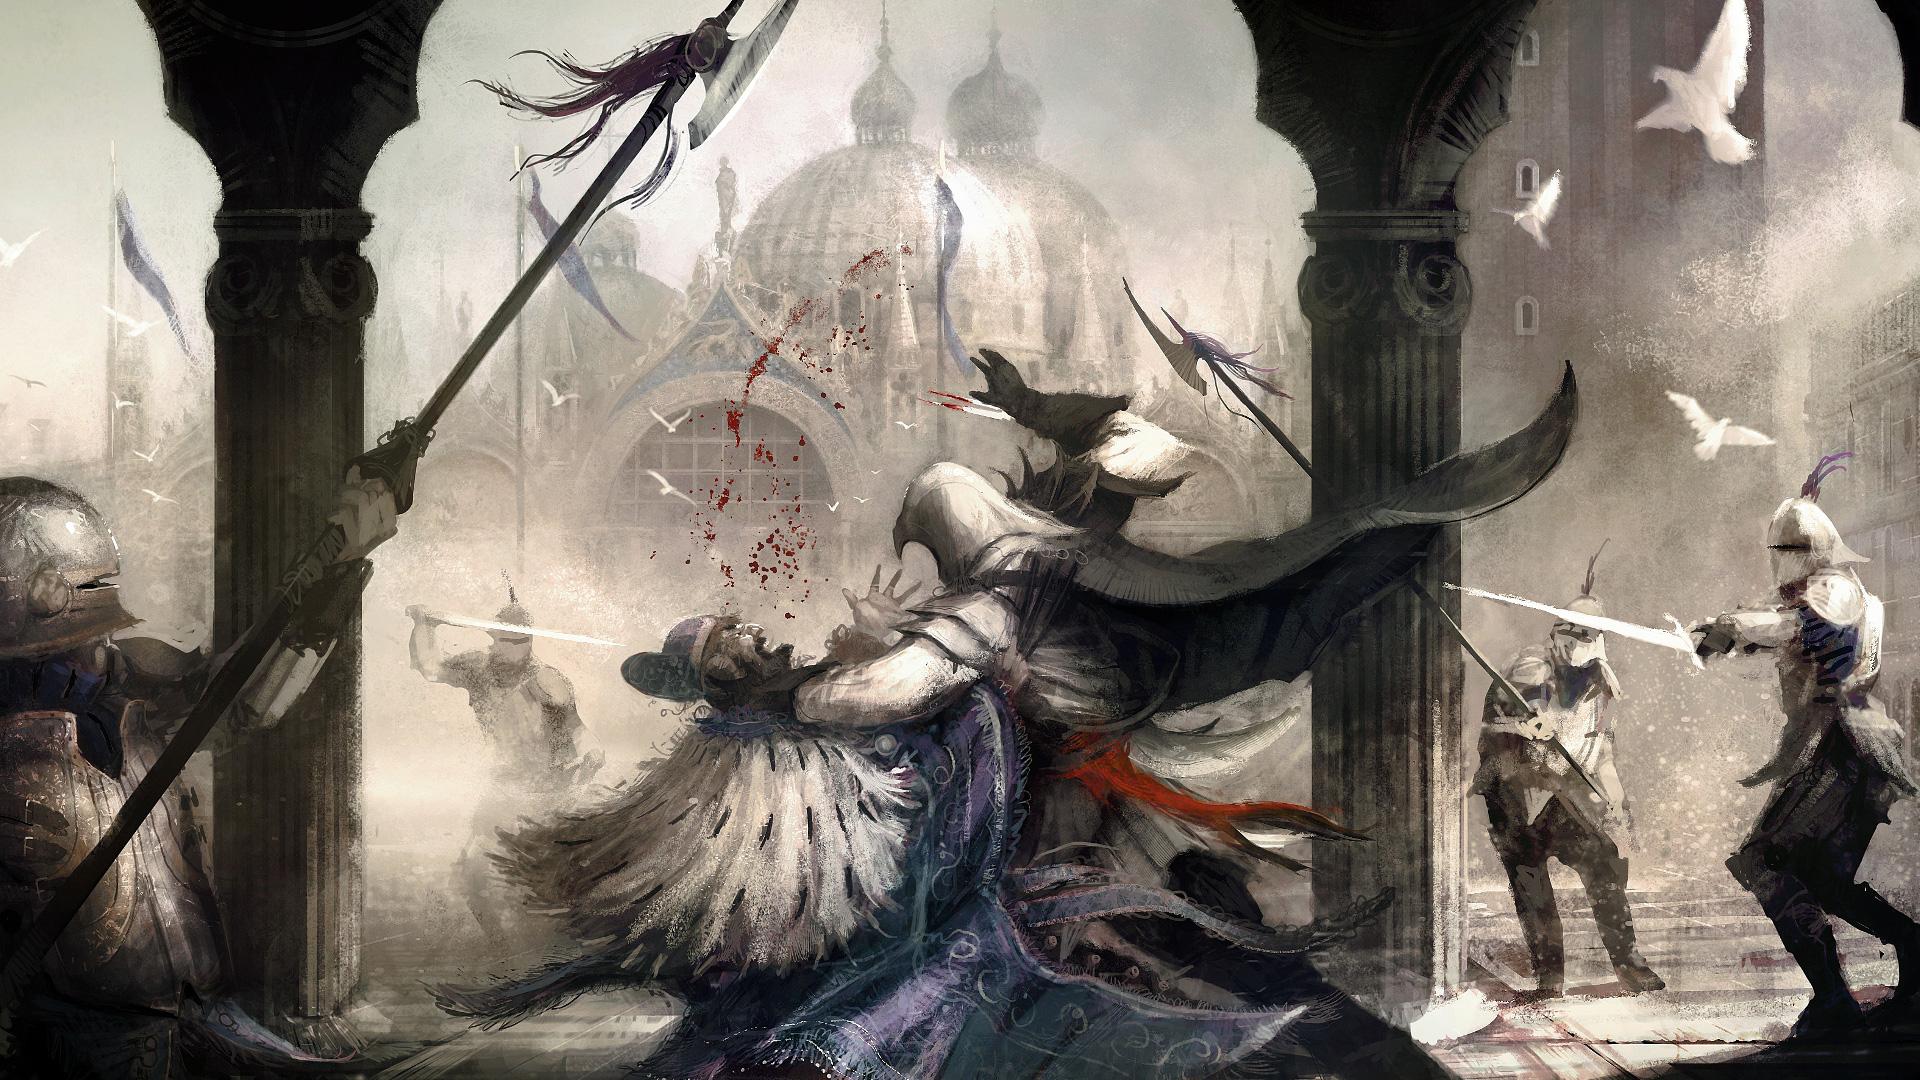 Assassins Creed 2 wallpaper 4